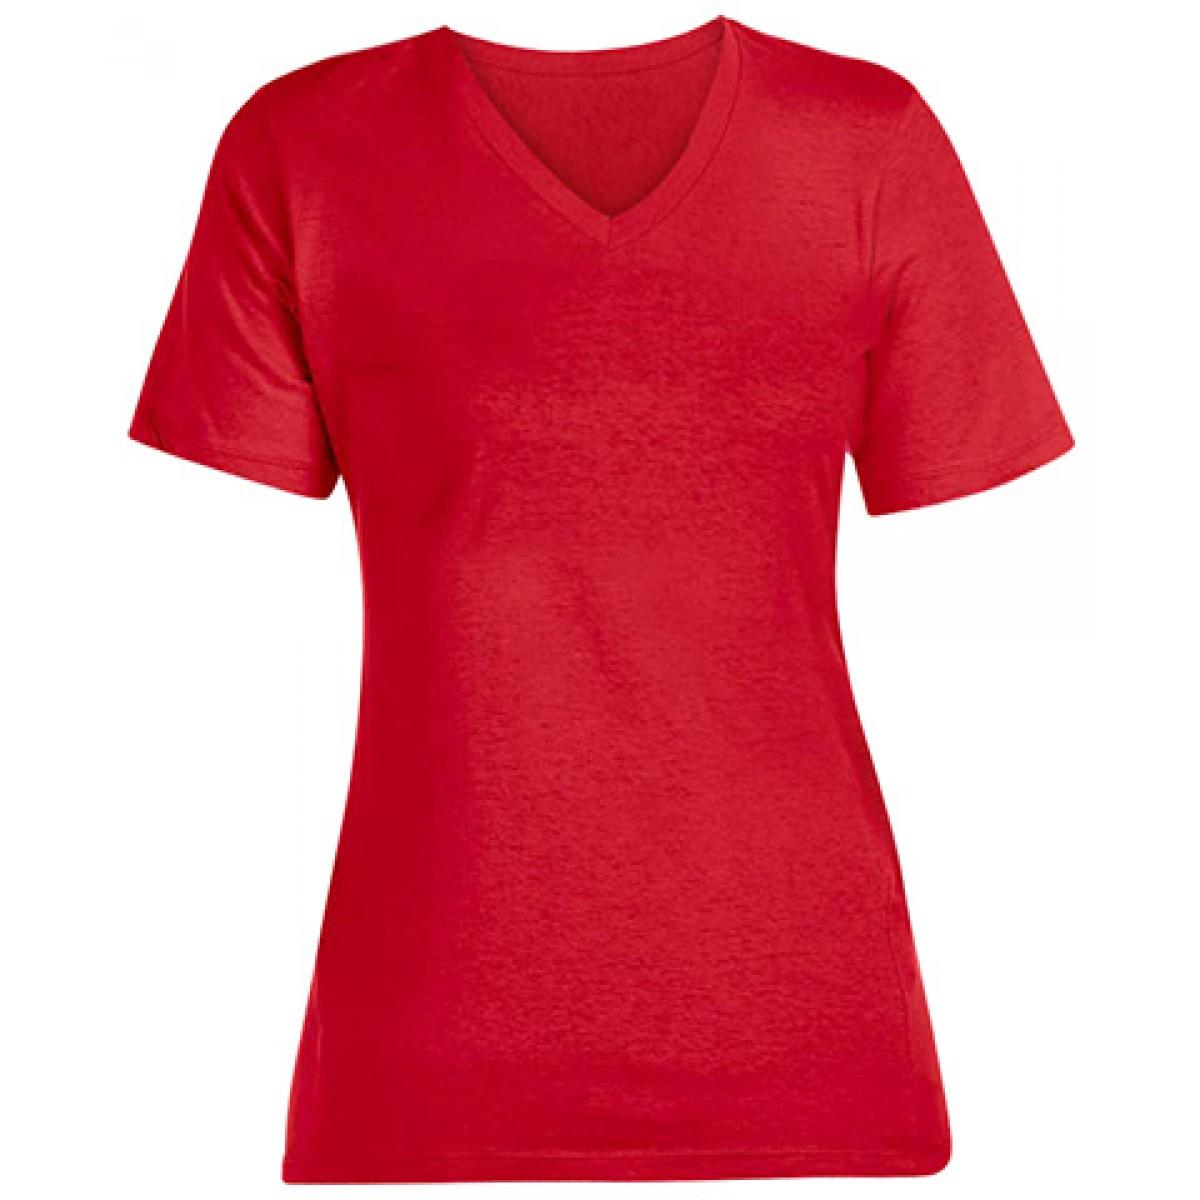 Short Sleeve V-Neck T-Shirt-Red-S